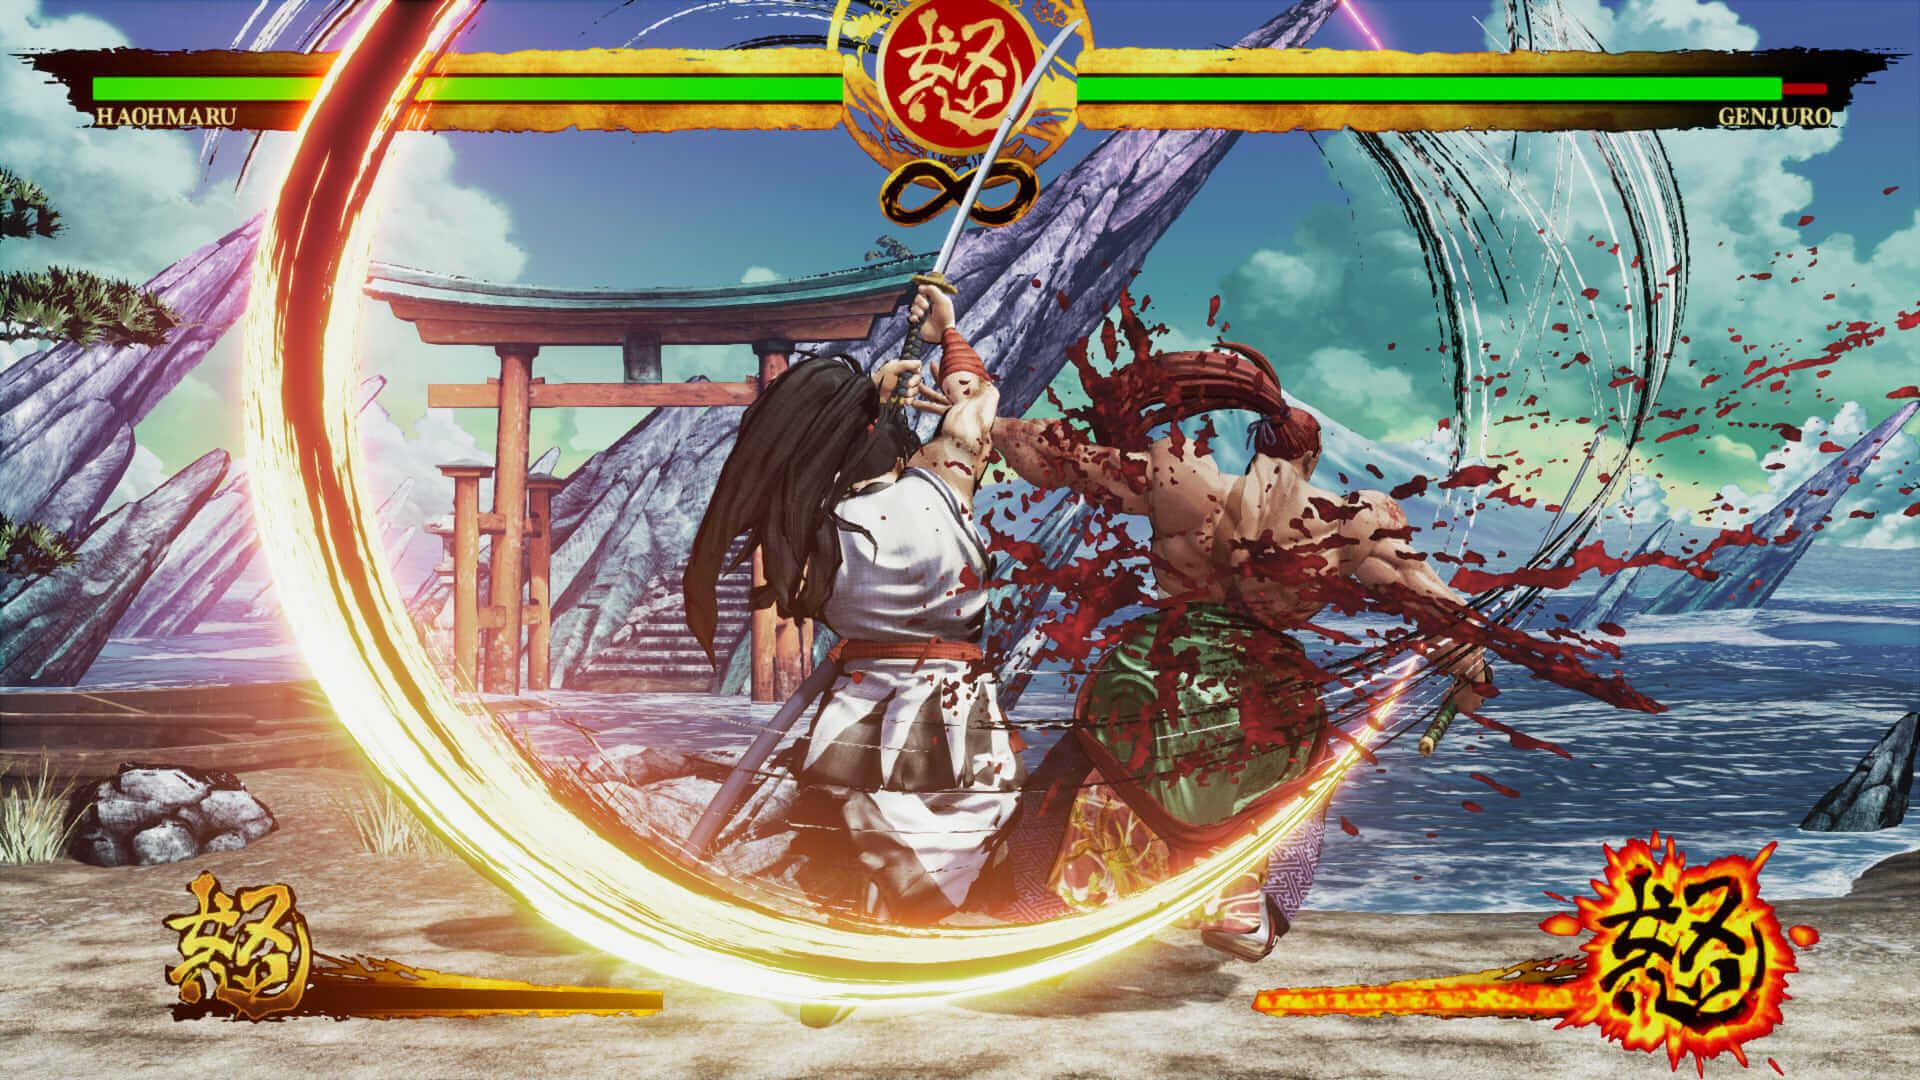 samurai-shodown-epic-games-storeda-bir-sure-ucretsiz